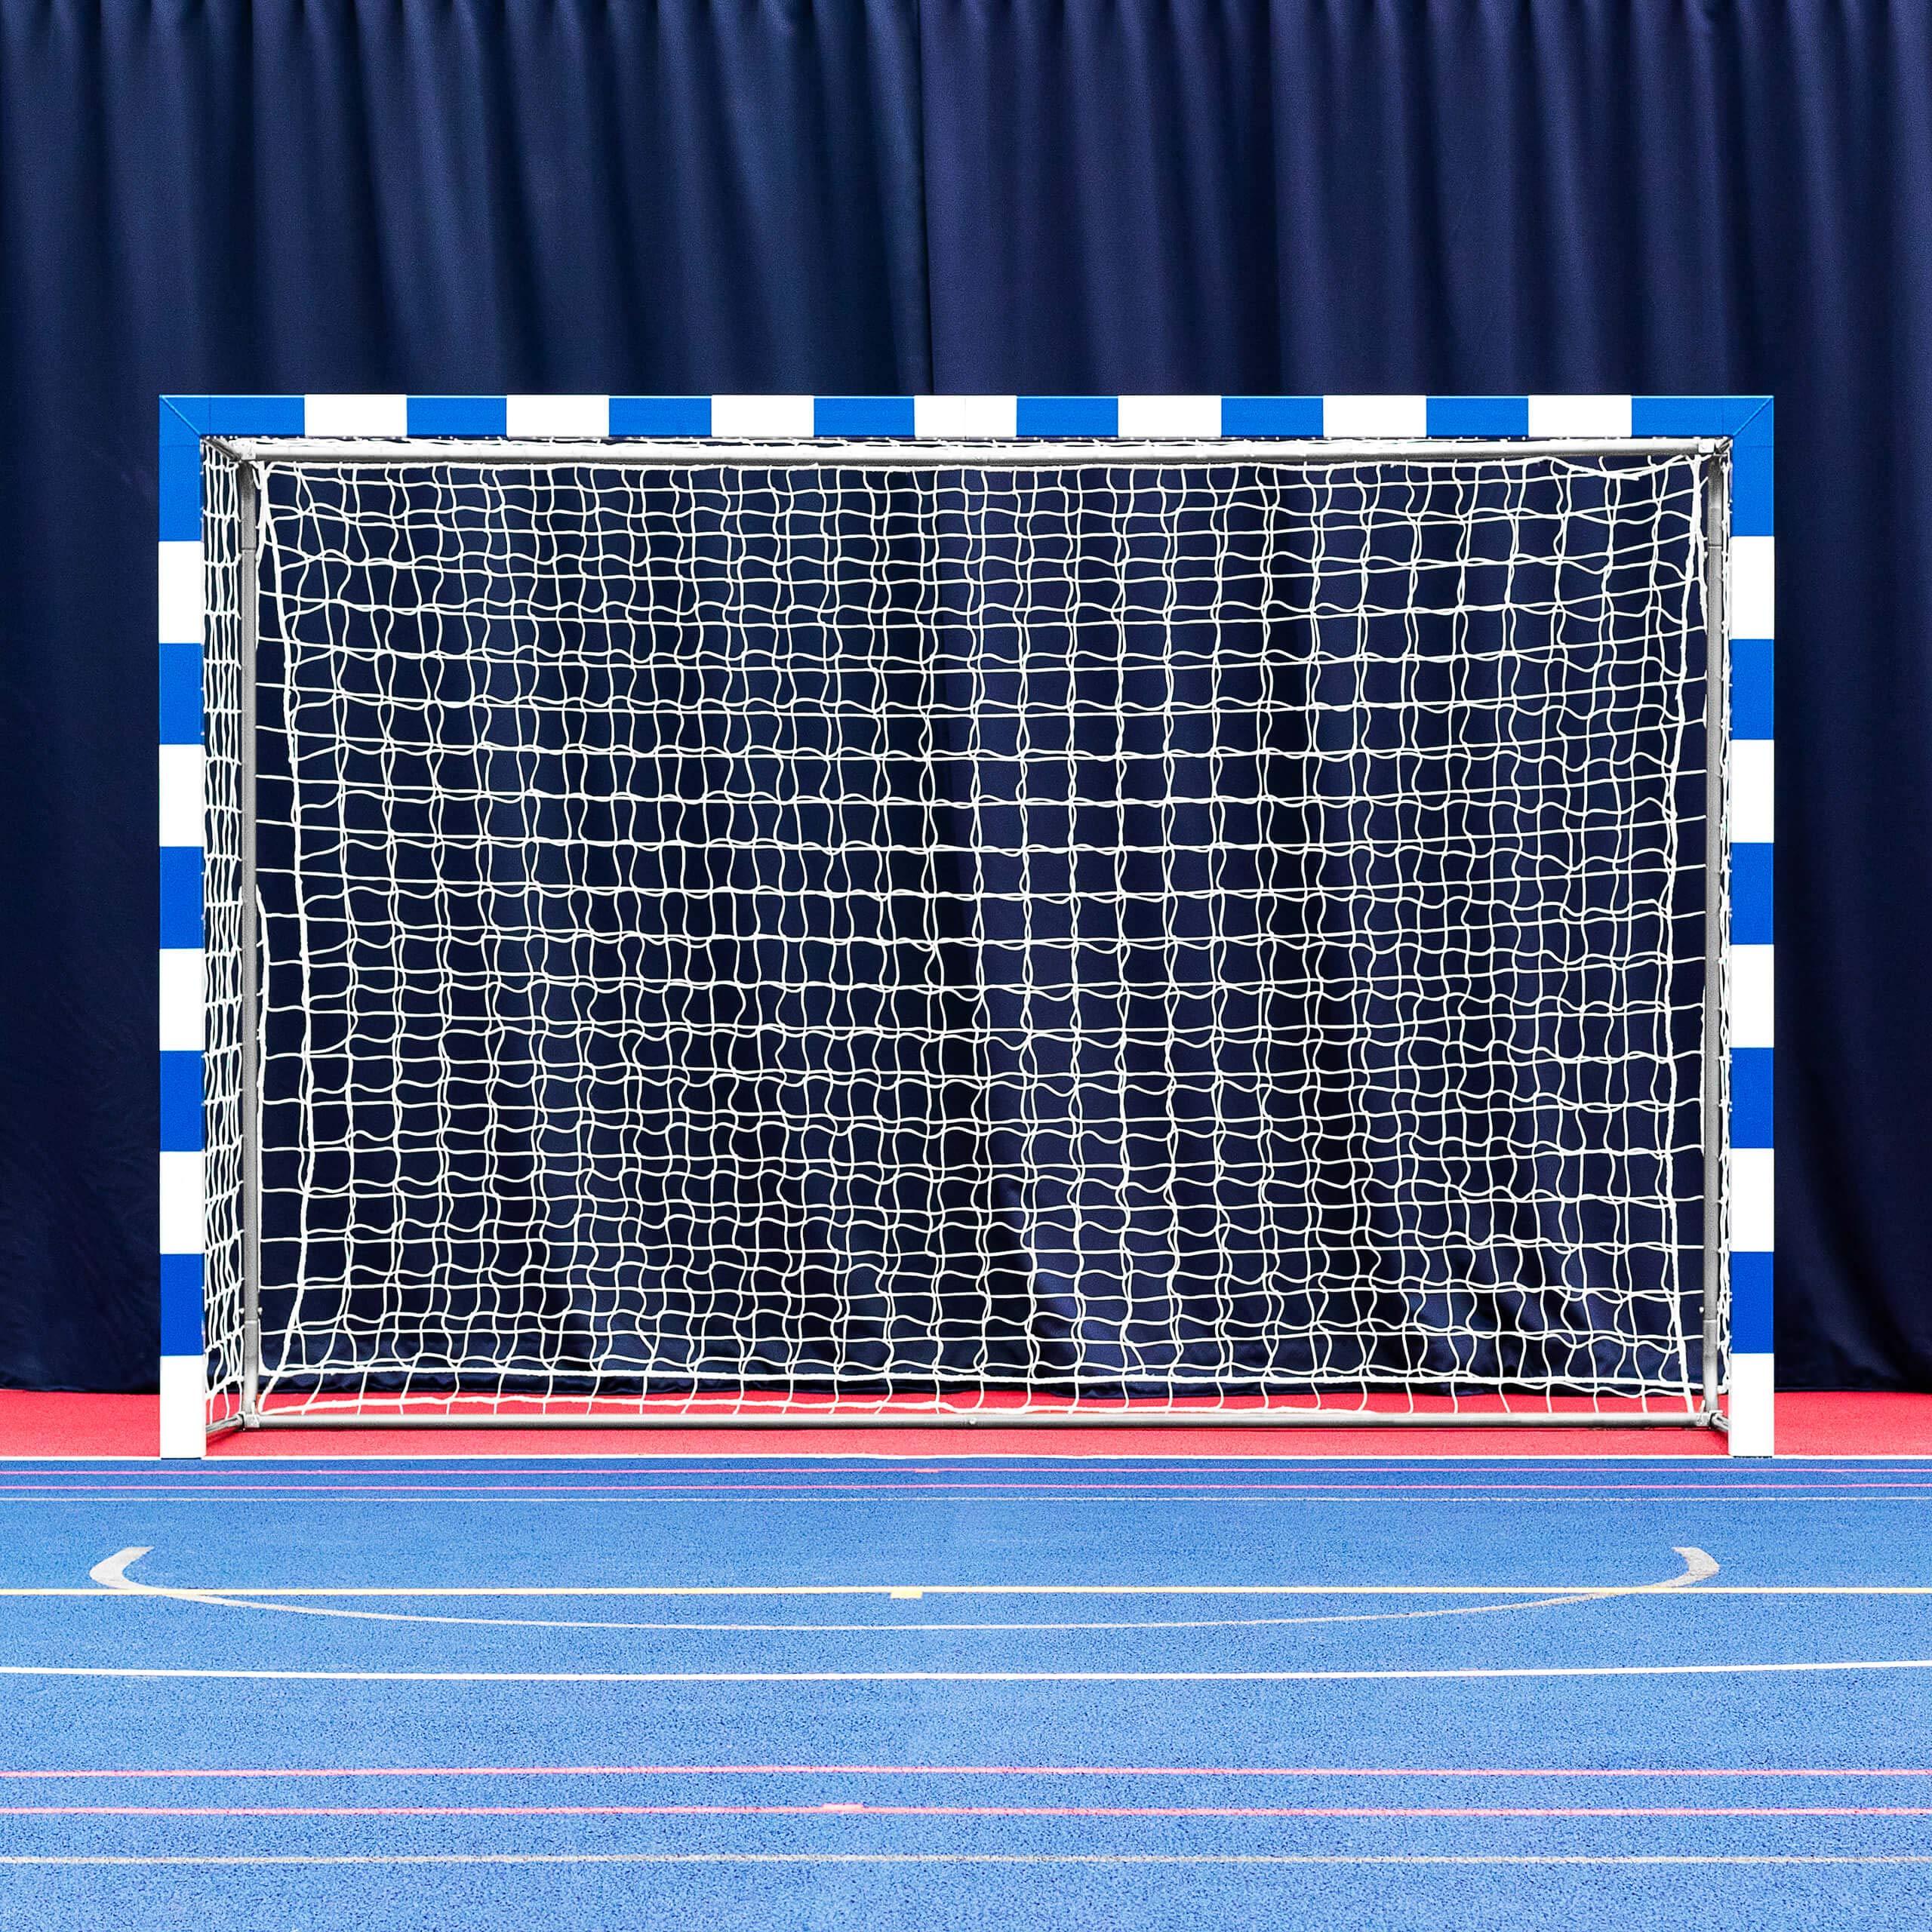 Forza Alu80 Competition Handball Goals   IHF Regulation Size 3m x 2m Handball Goal [Net World Sports] (Pair, Blue) by Forza (Image #2)